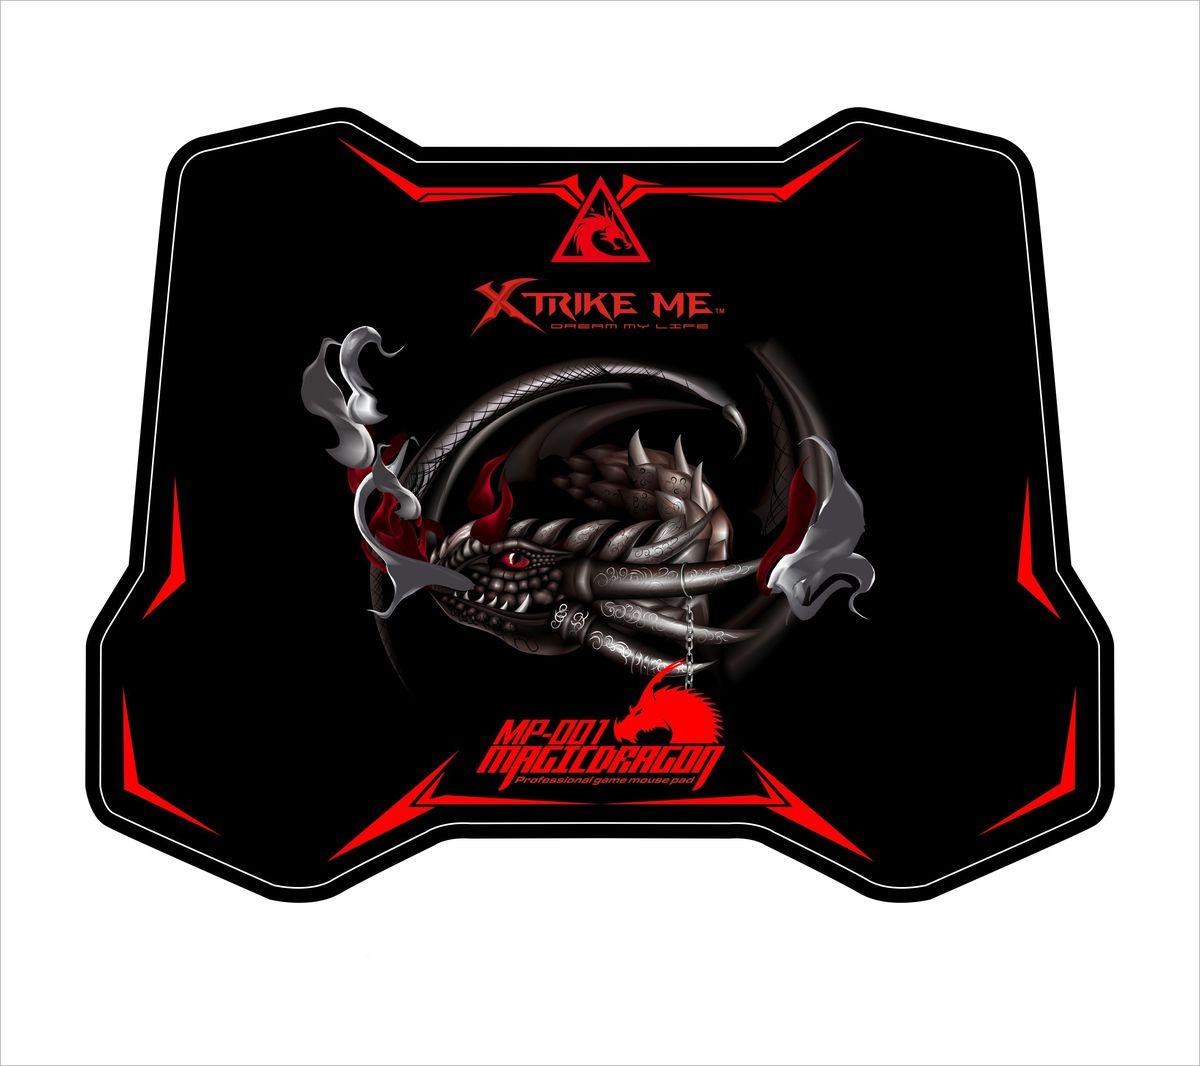 Xtrike Me MP-001 игровой коврик для мыши